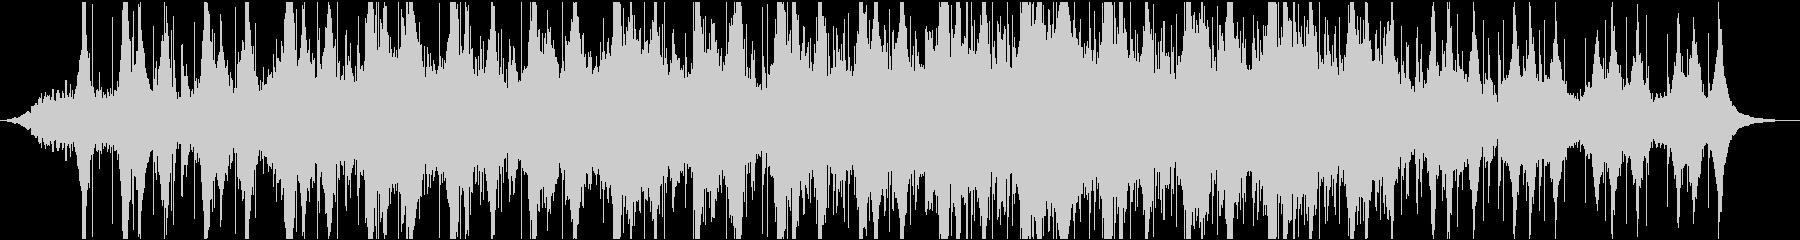 Atmosphericの未再生の波形